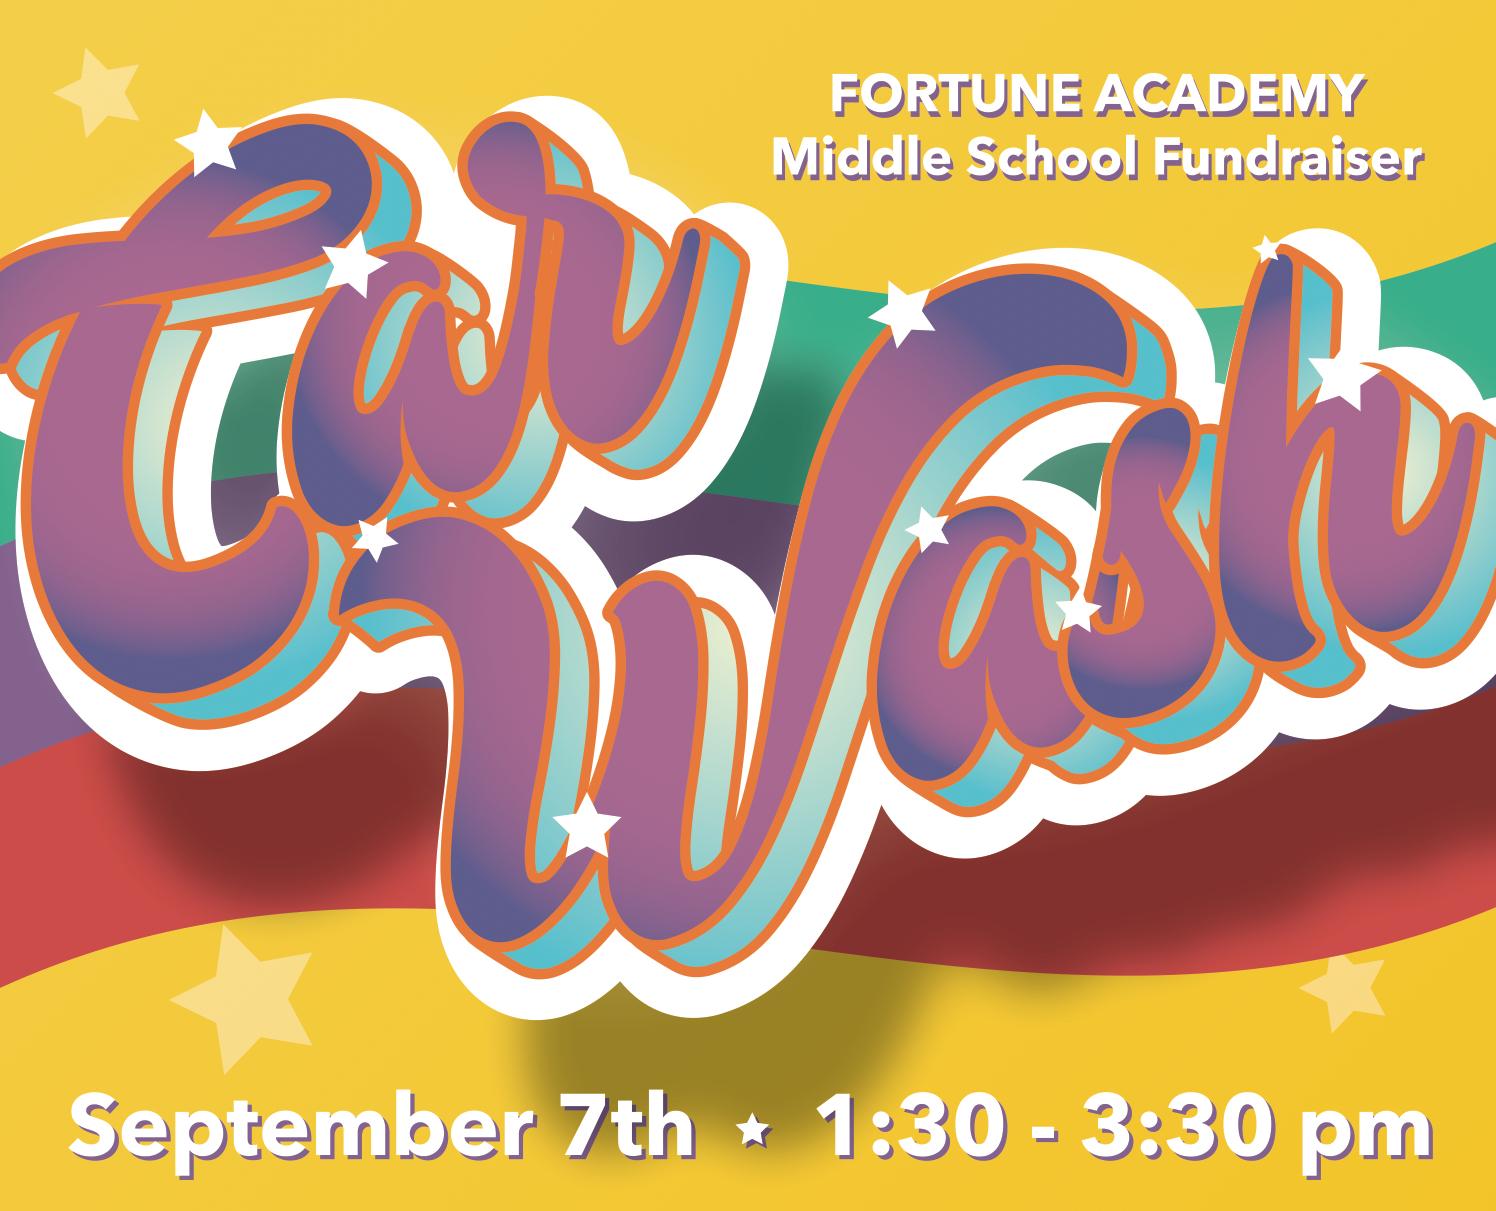 Jr High Car Wash Fundraiser Fortune Academy